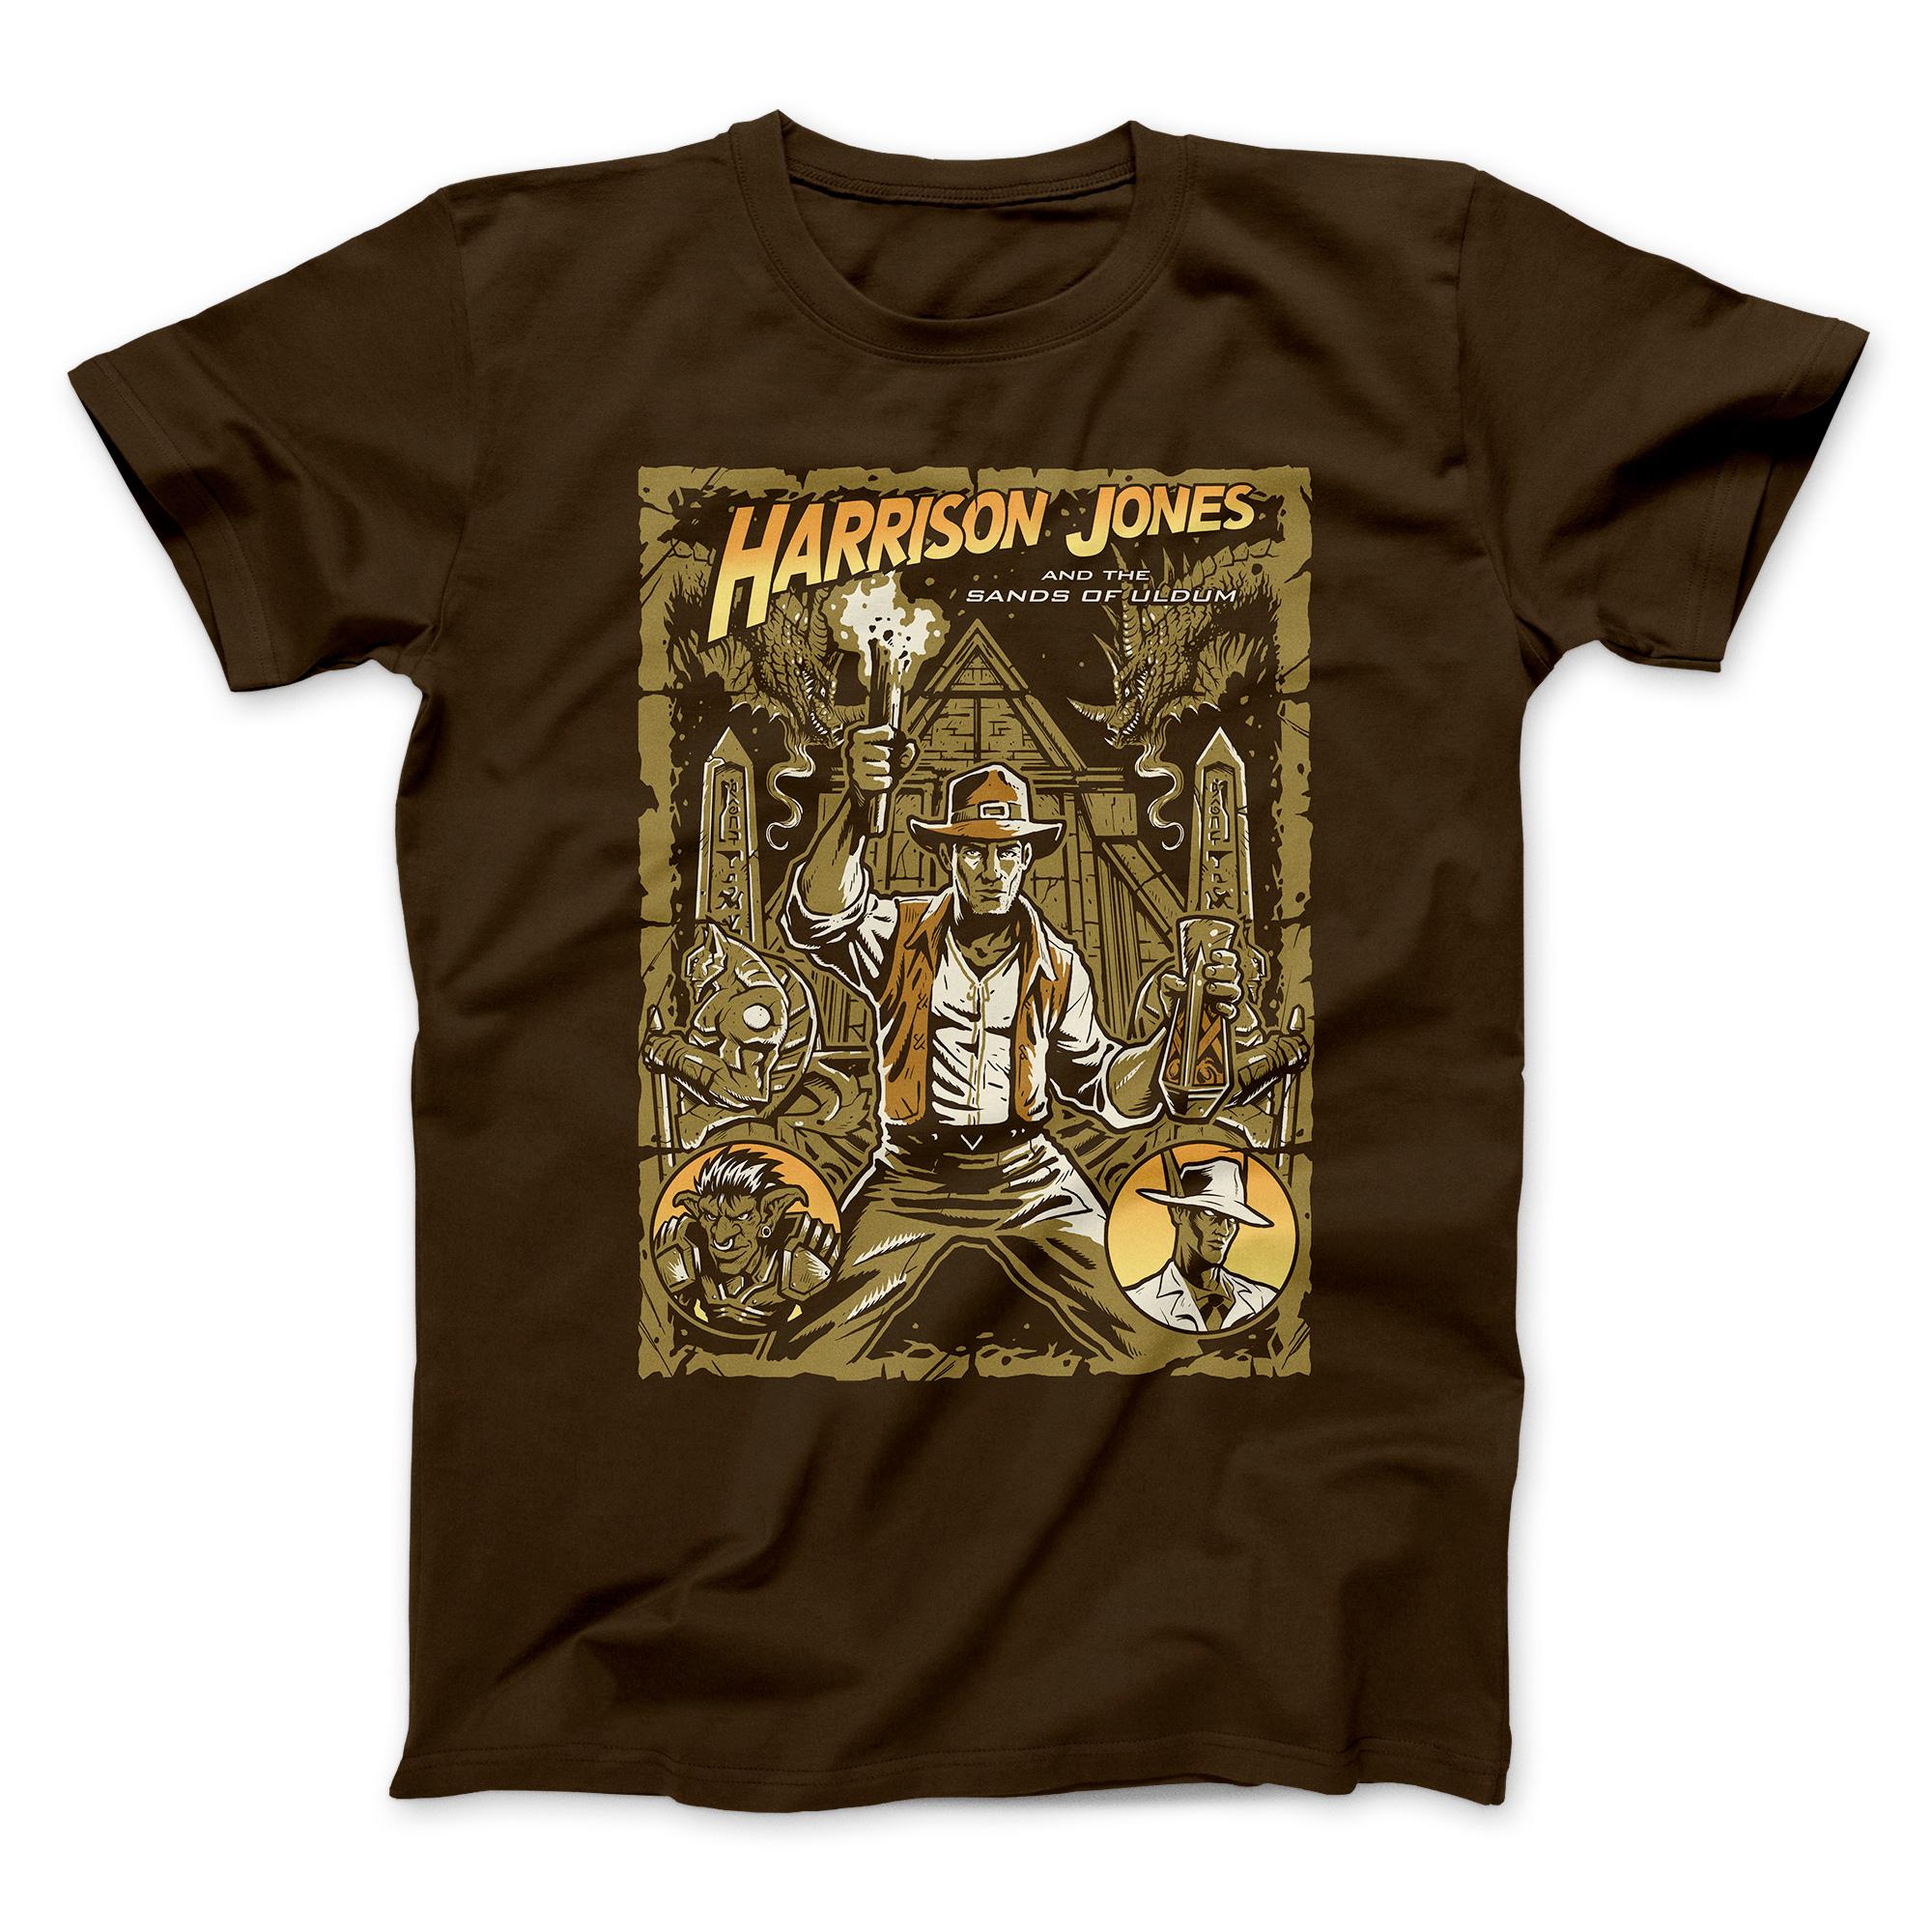 World of Warcraft - Harrison Jones